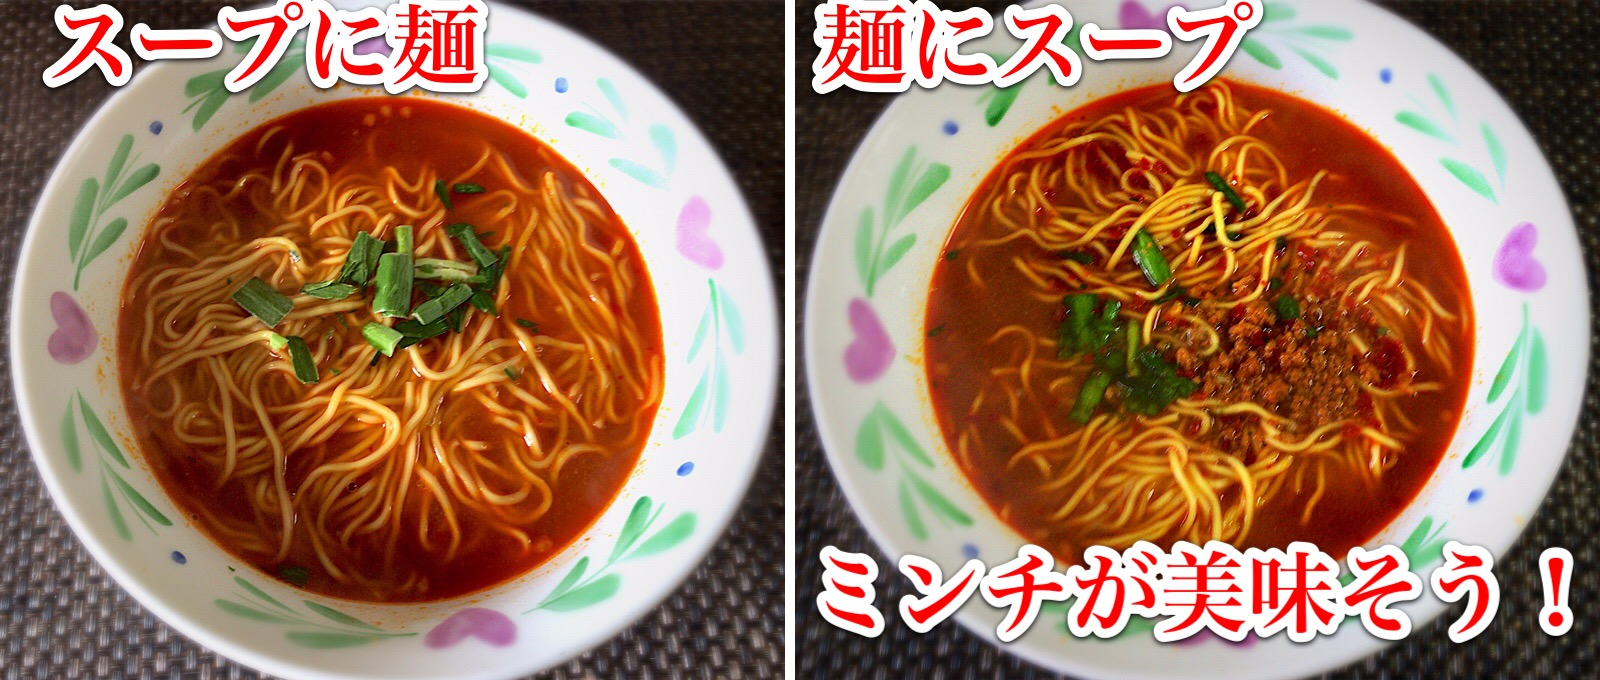 元祖味仙本店監修『台湾ラーメン』